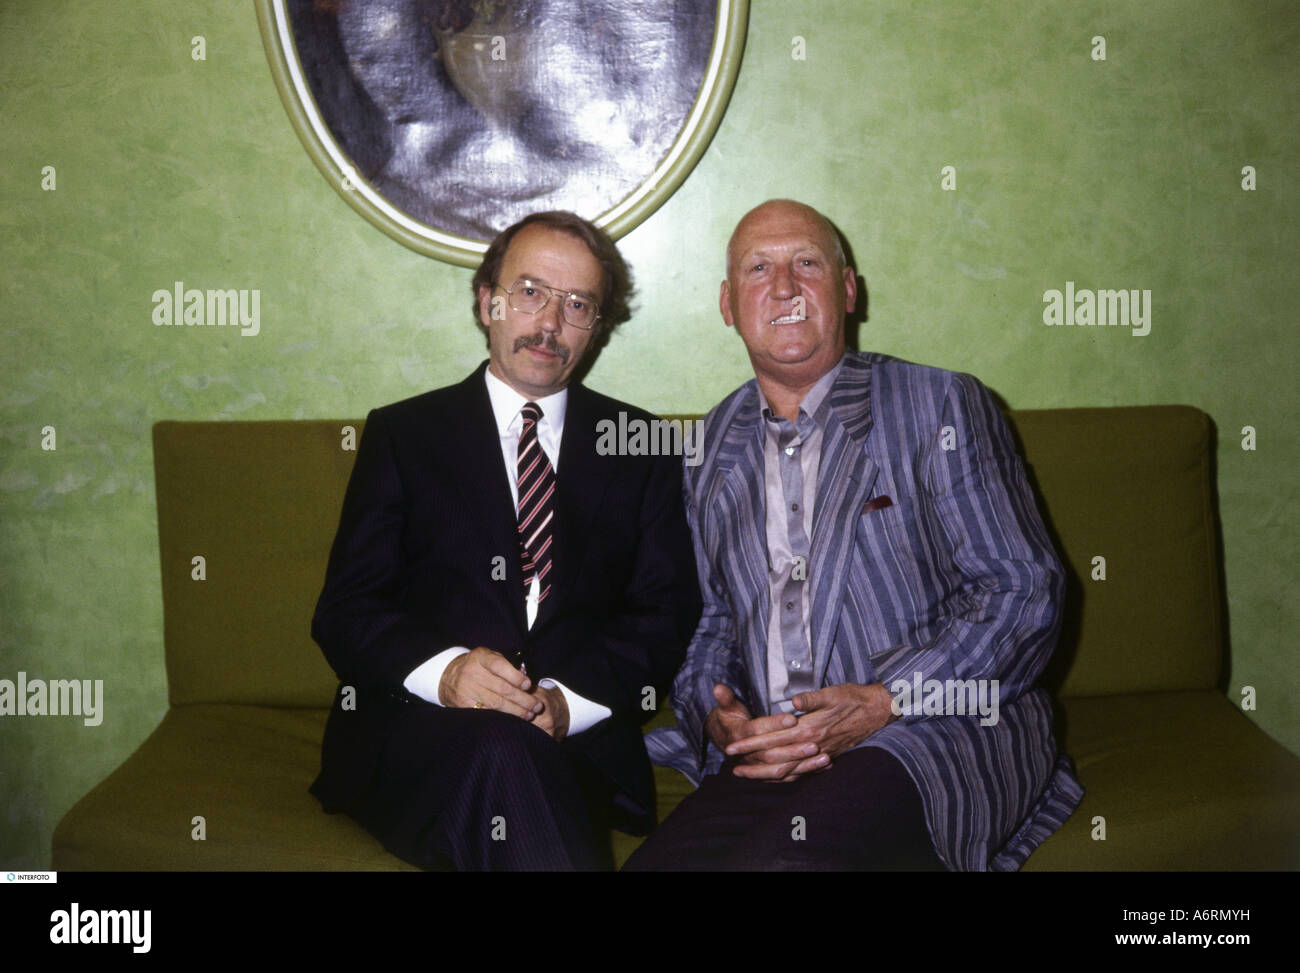 'Kempowski, Walter, 29.4.1929 - 5.10.2007, German author / writer, half length, with Karl Lieffen, presentation - Stock Image